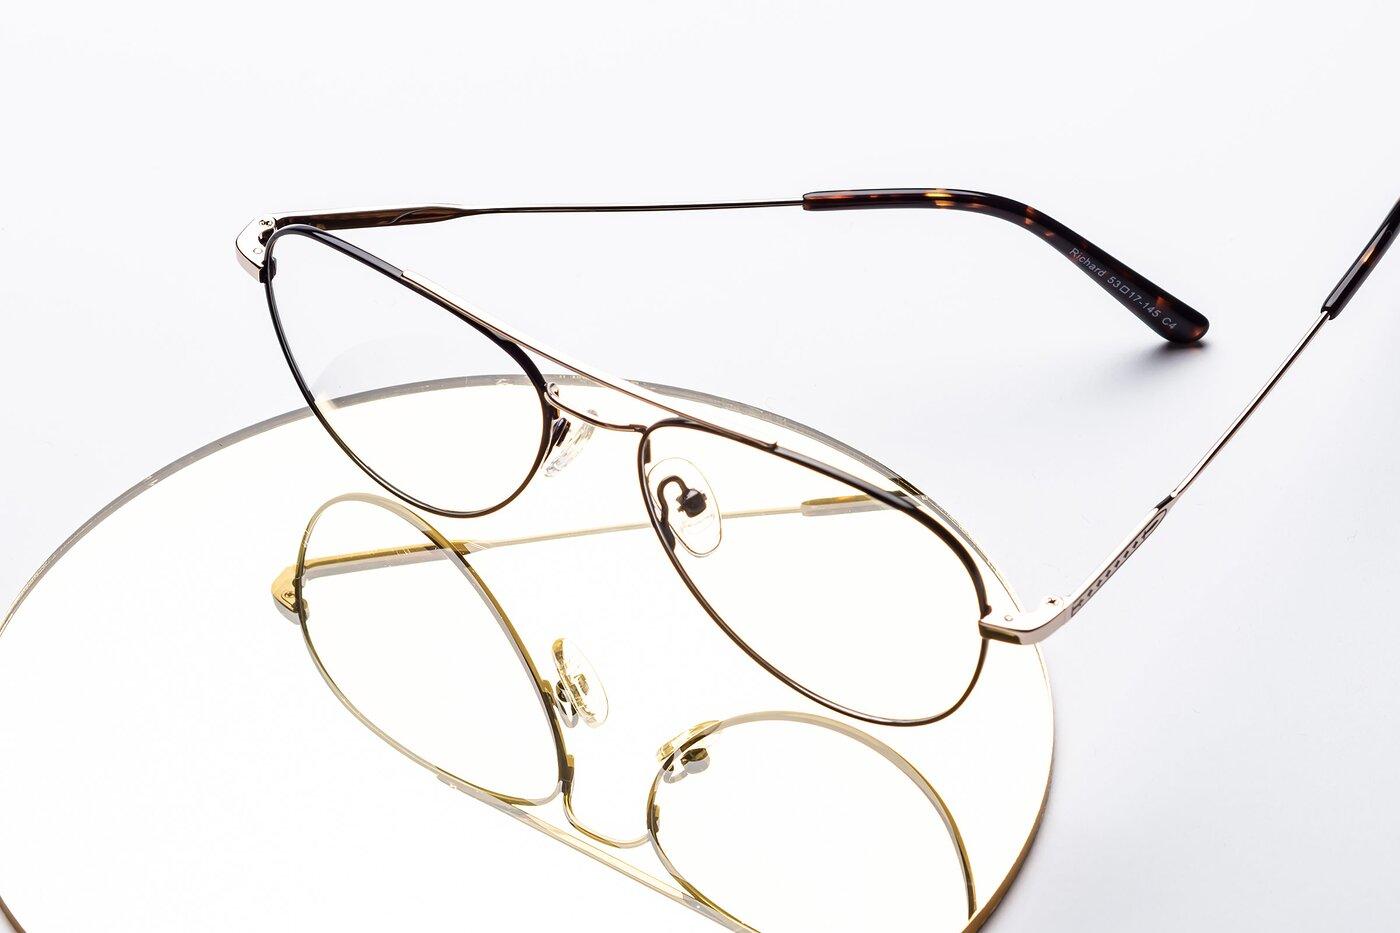 Black-Gold Lightweight Metal Aviator Eyeglasses